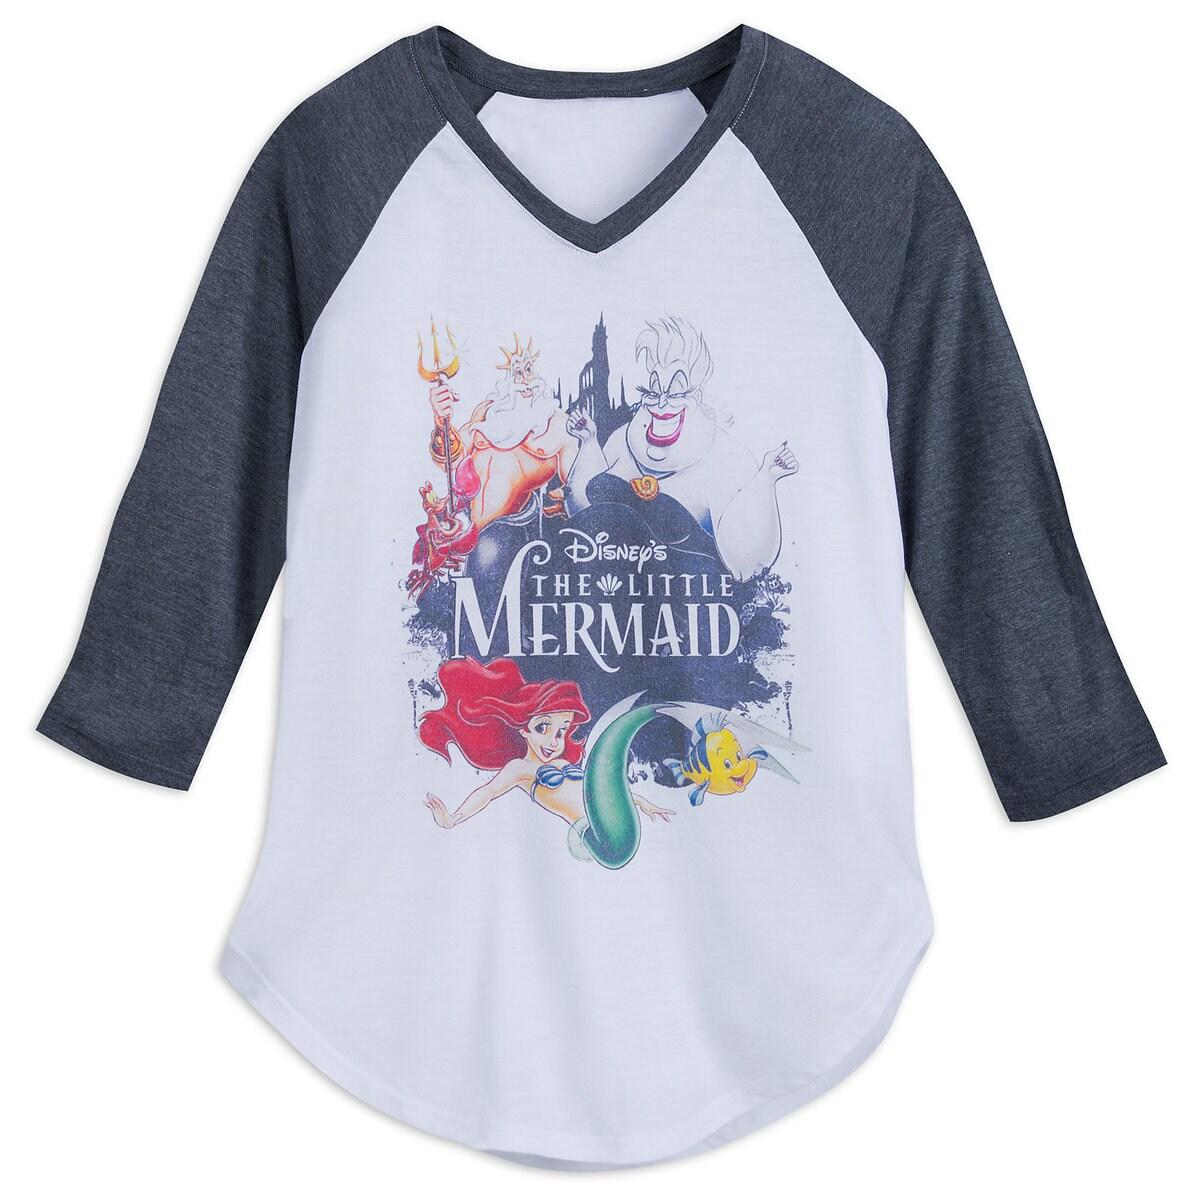 4b4ef0e00 Product Image of The Little Mermaid Raglan T-Shirt for Juniors # 1